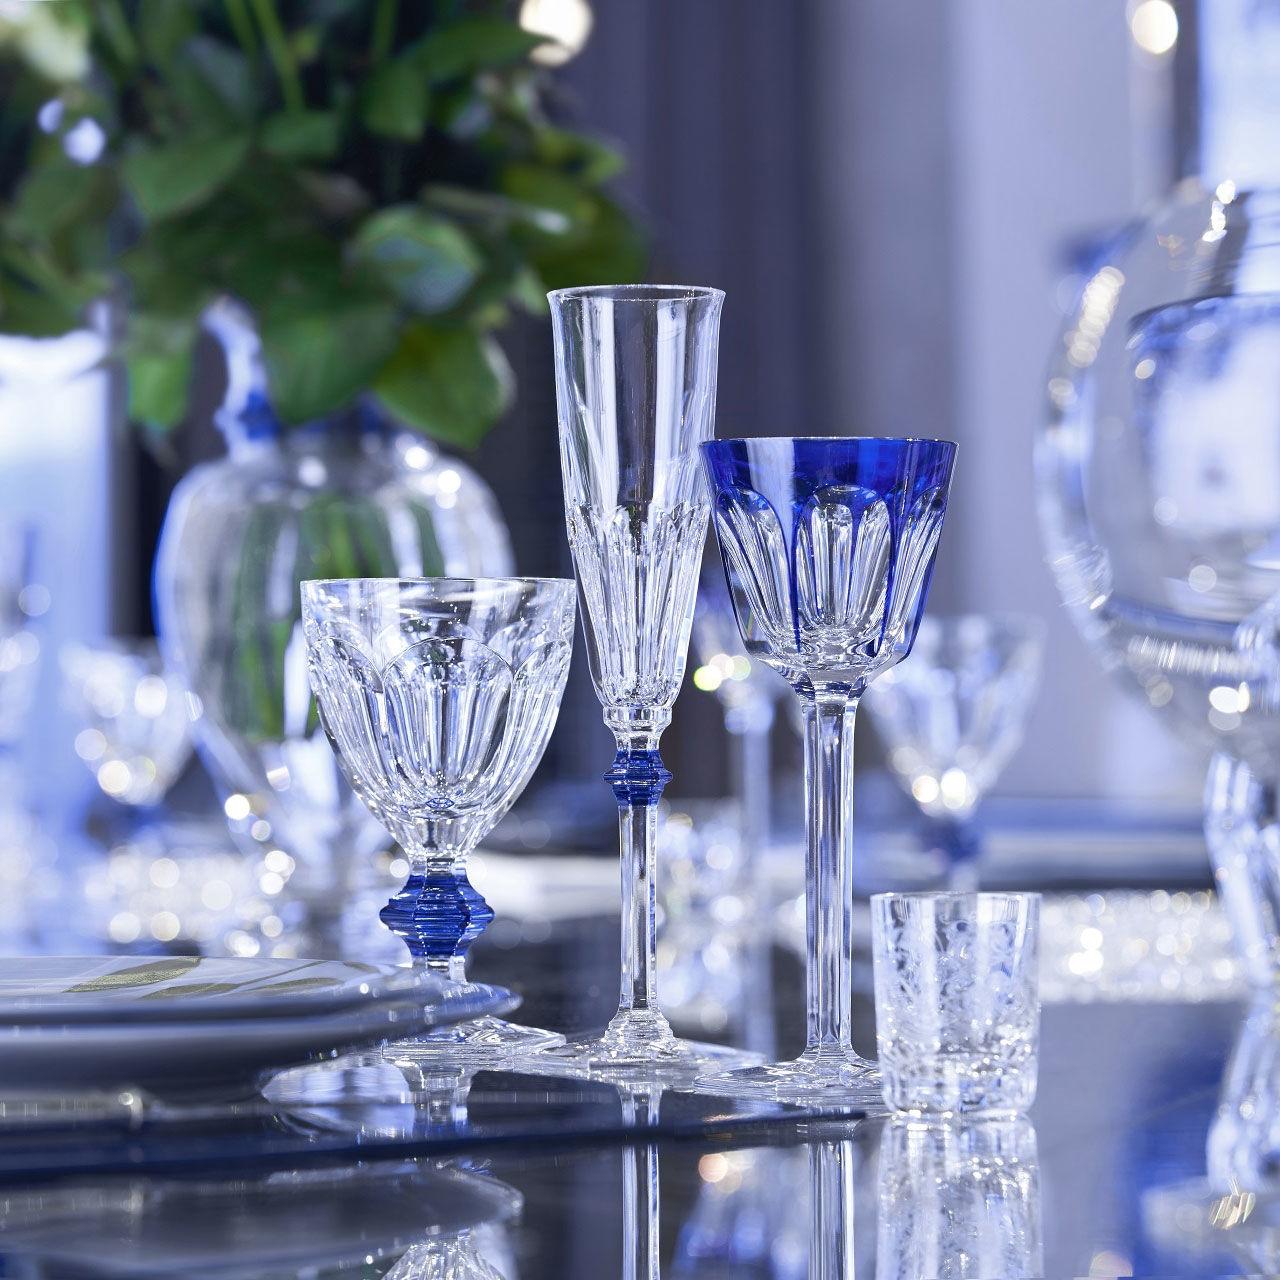 verre baccarat harcourt 1841 verre clair et bleu 2811102. Black Bedroom Furniture Sets. Home Design Ideas